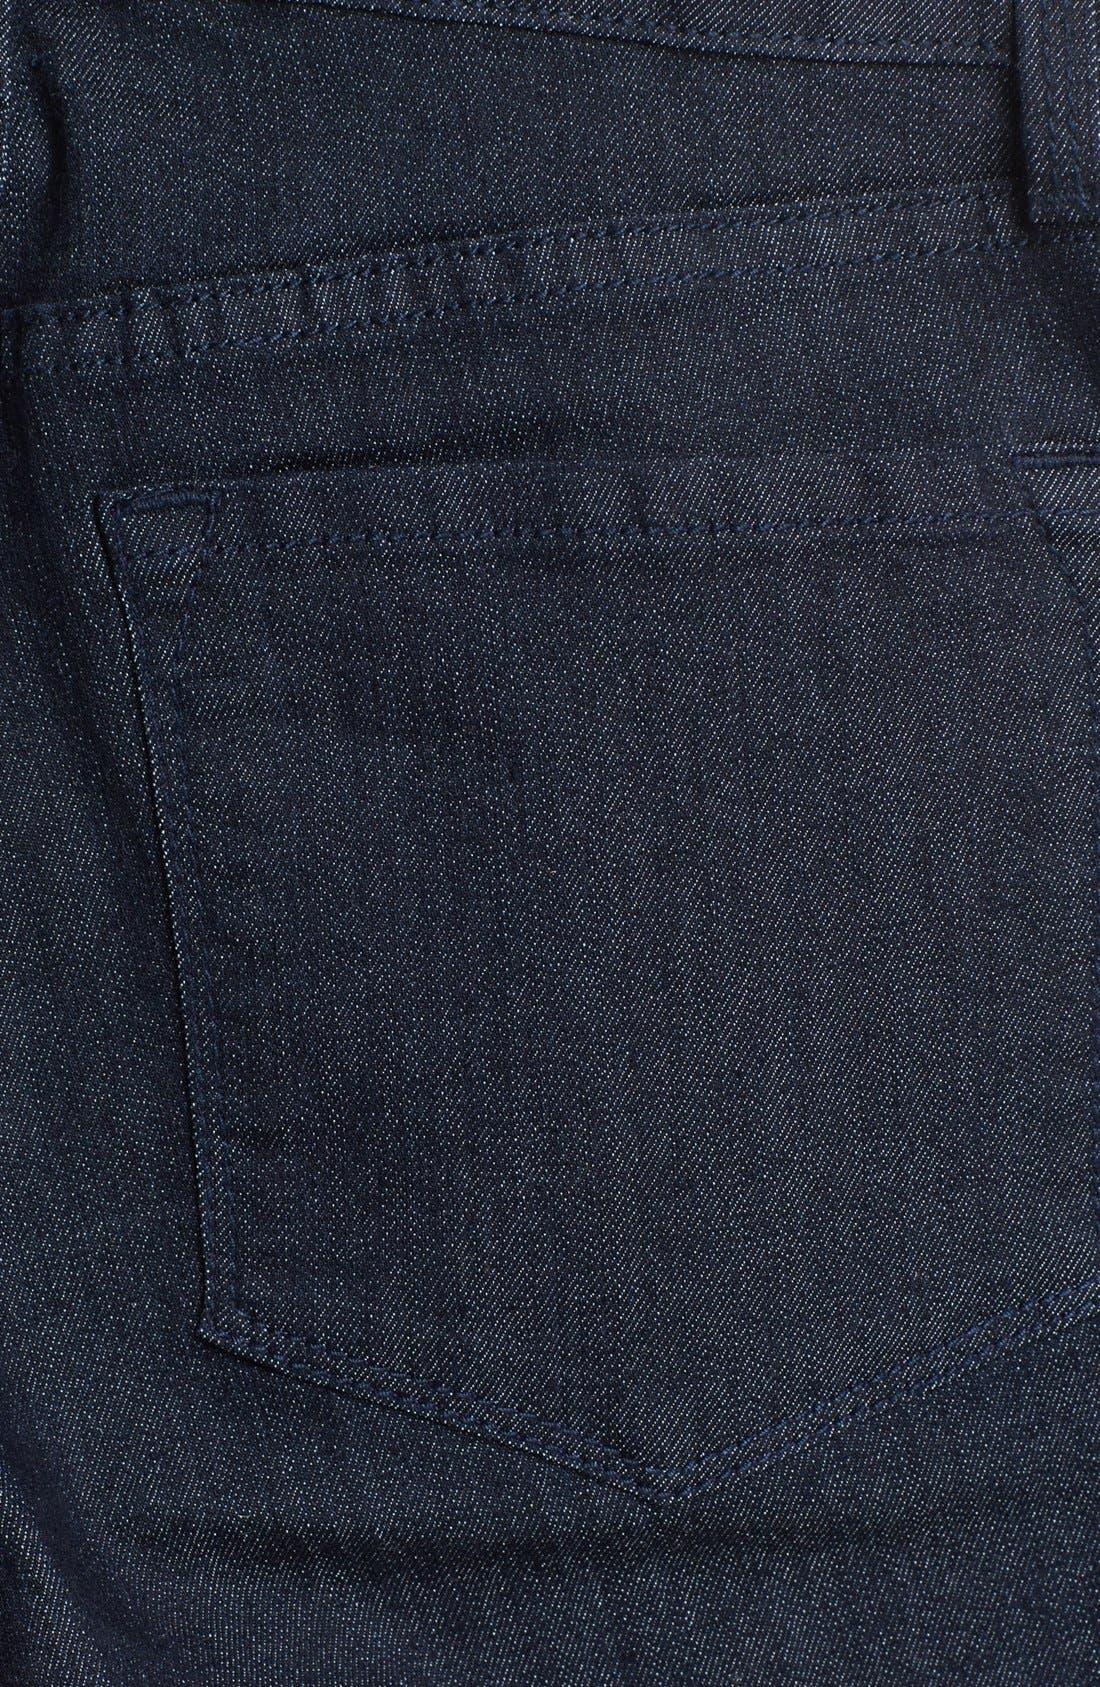 Alternate Image 3  - NYDJ 'Alina' Stretch Skinny Jeans (Dark Enzyme) (Petite)